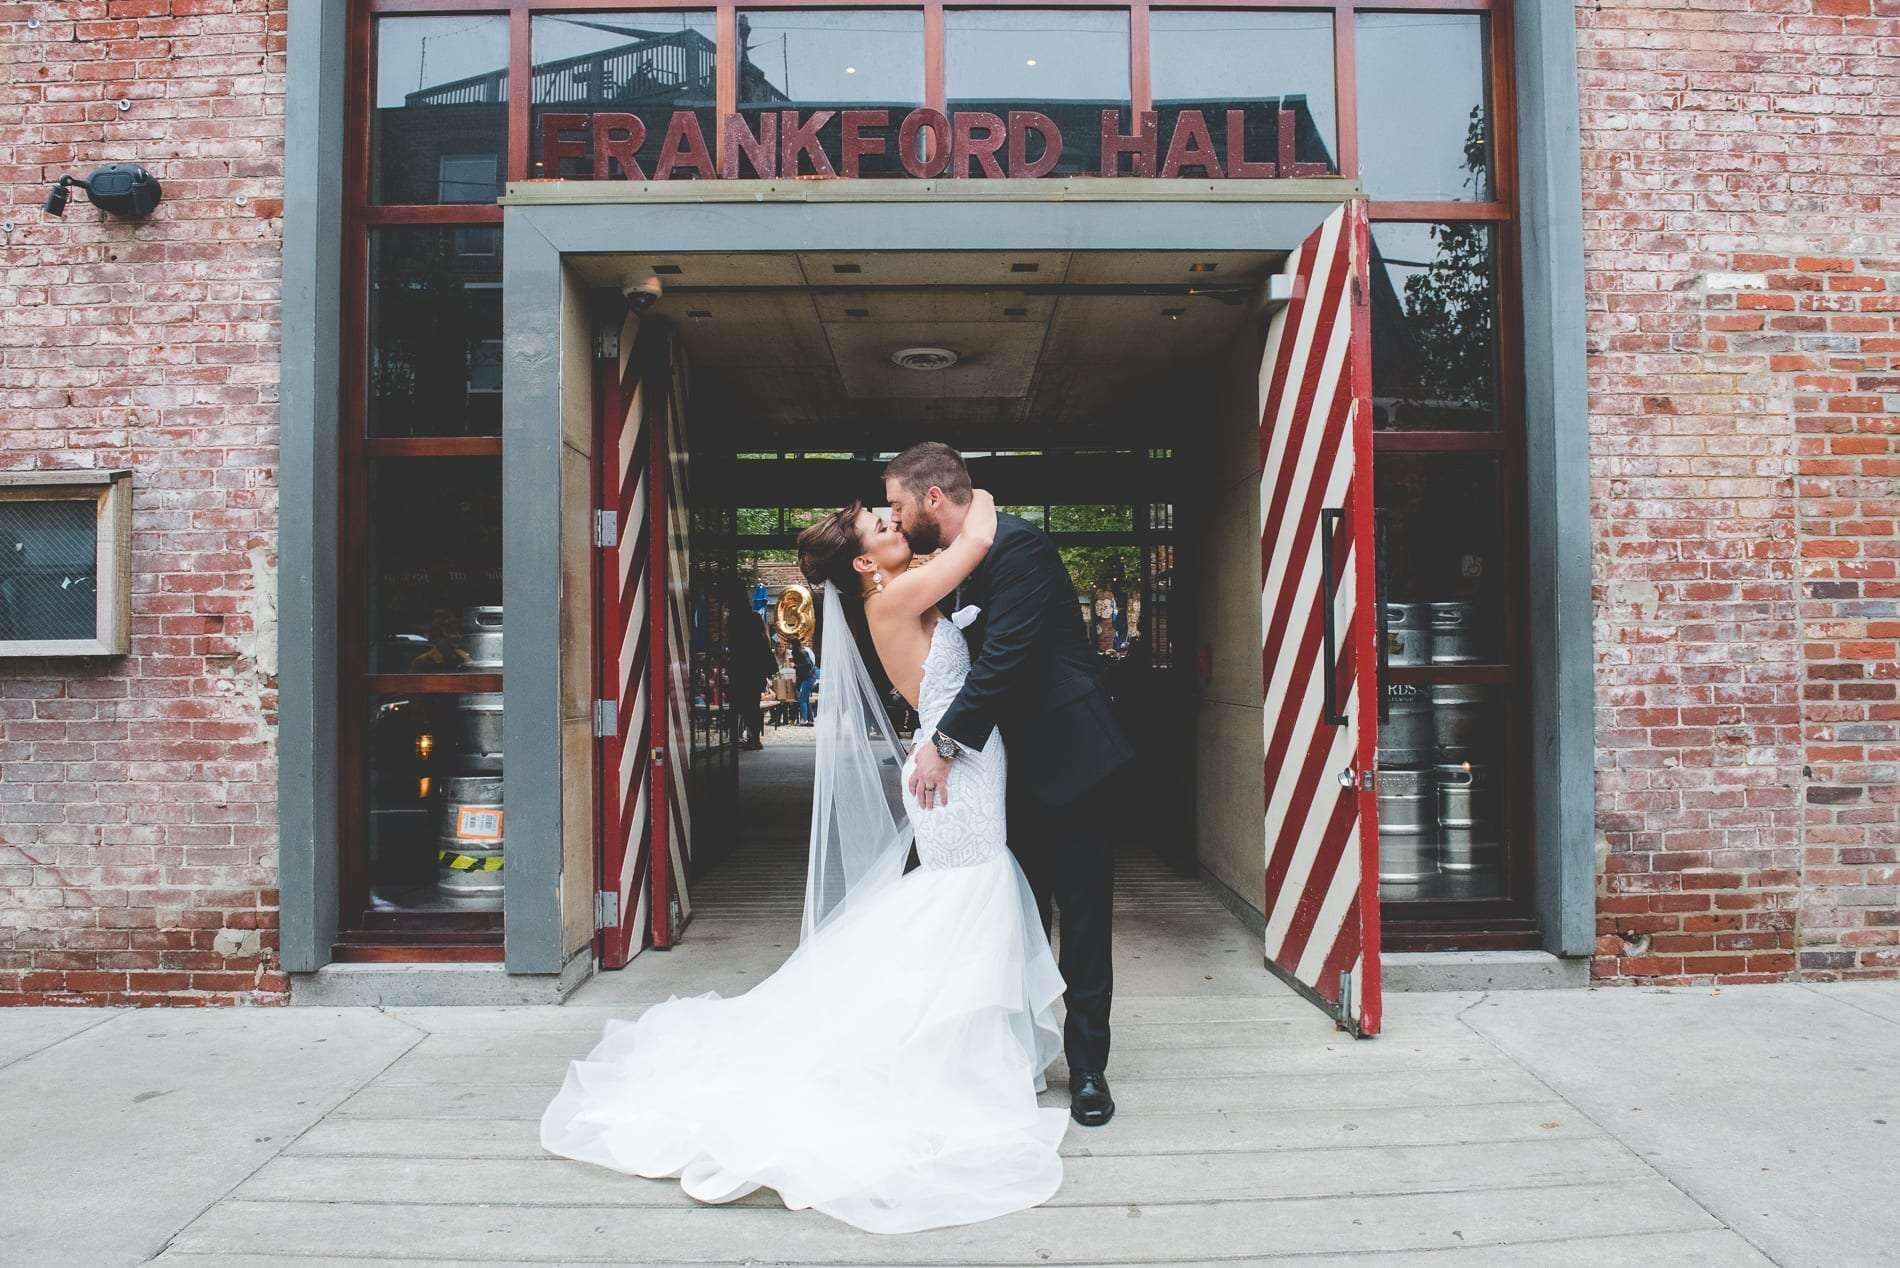 Frankford hall wedding photos philadelphia